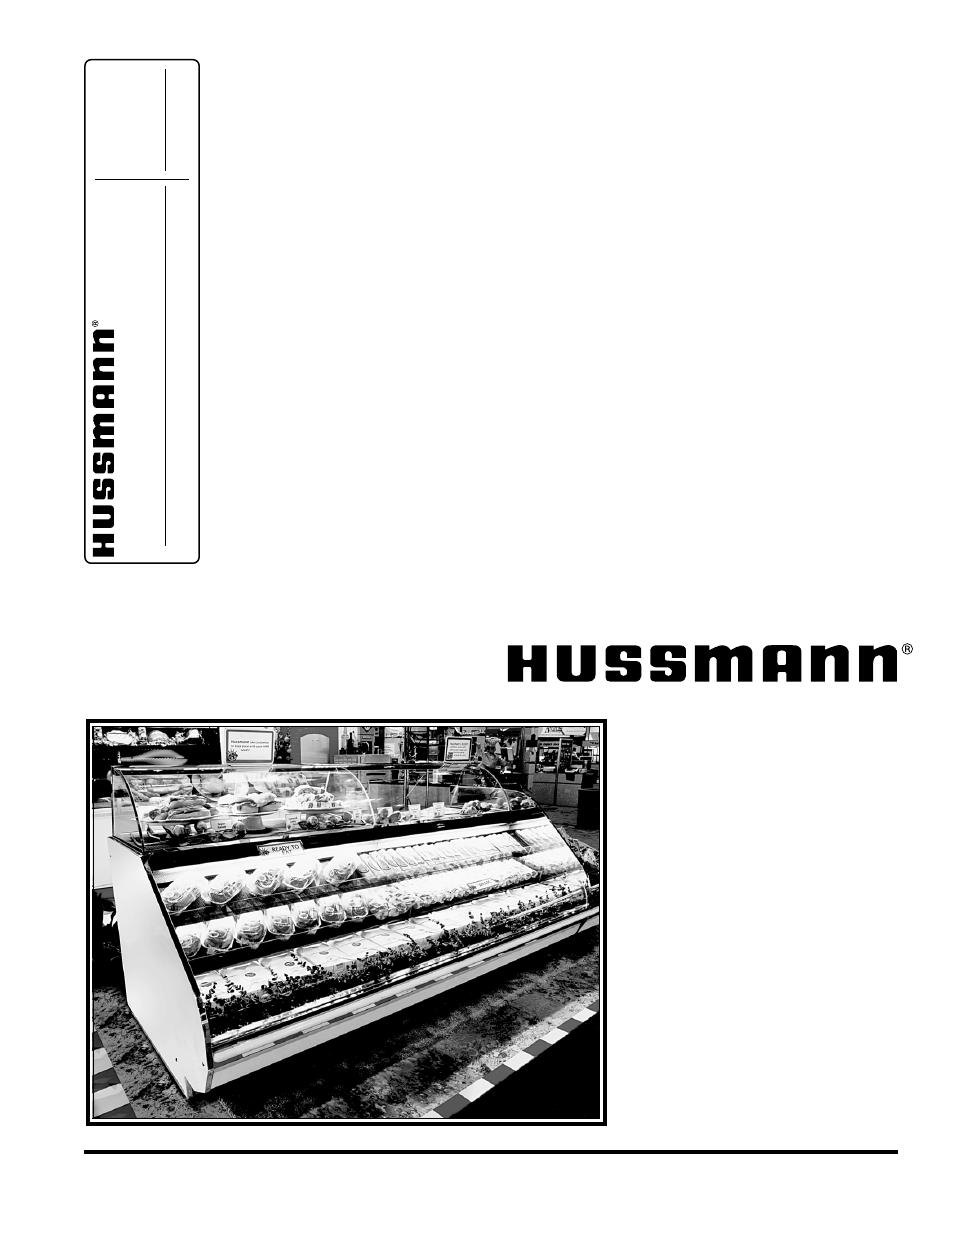 hussmann rgssfp user manual